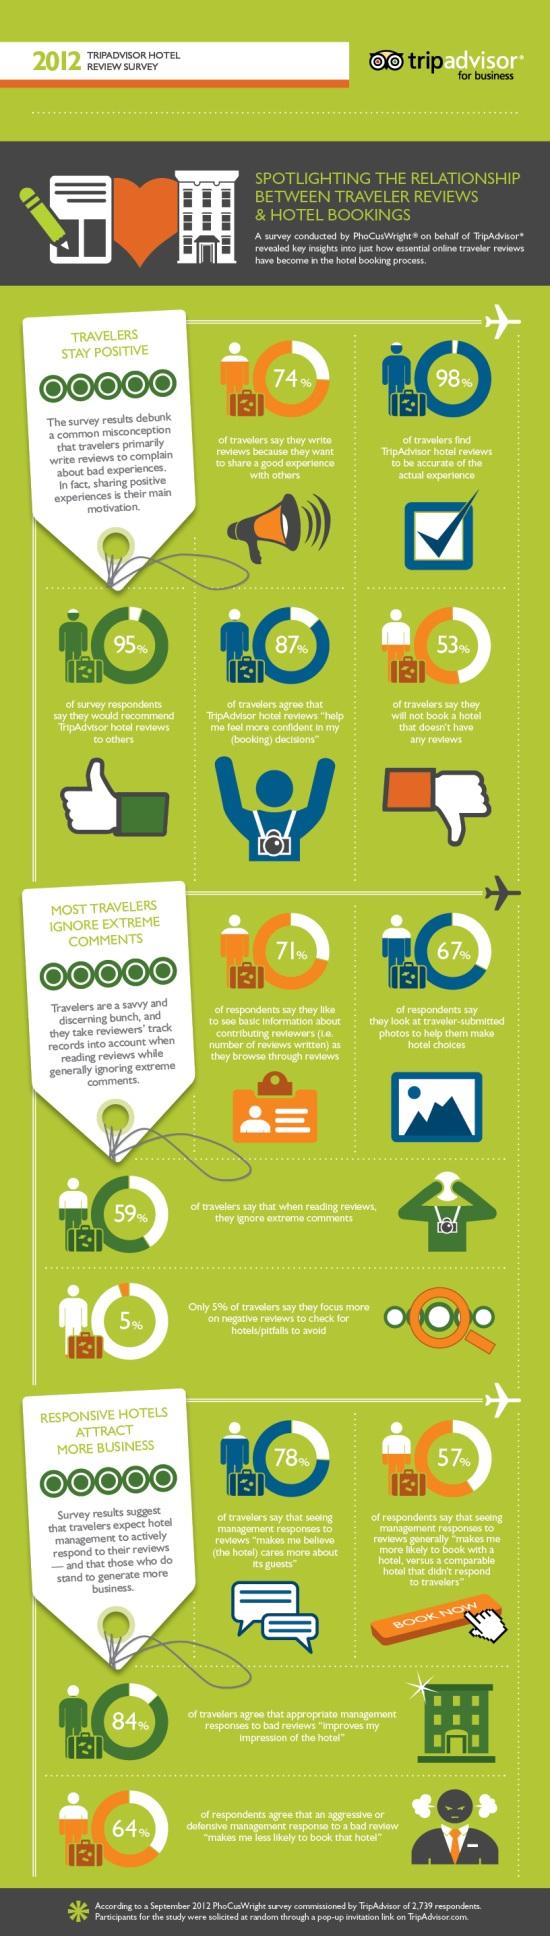 reputazione online turistica infografica